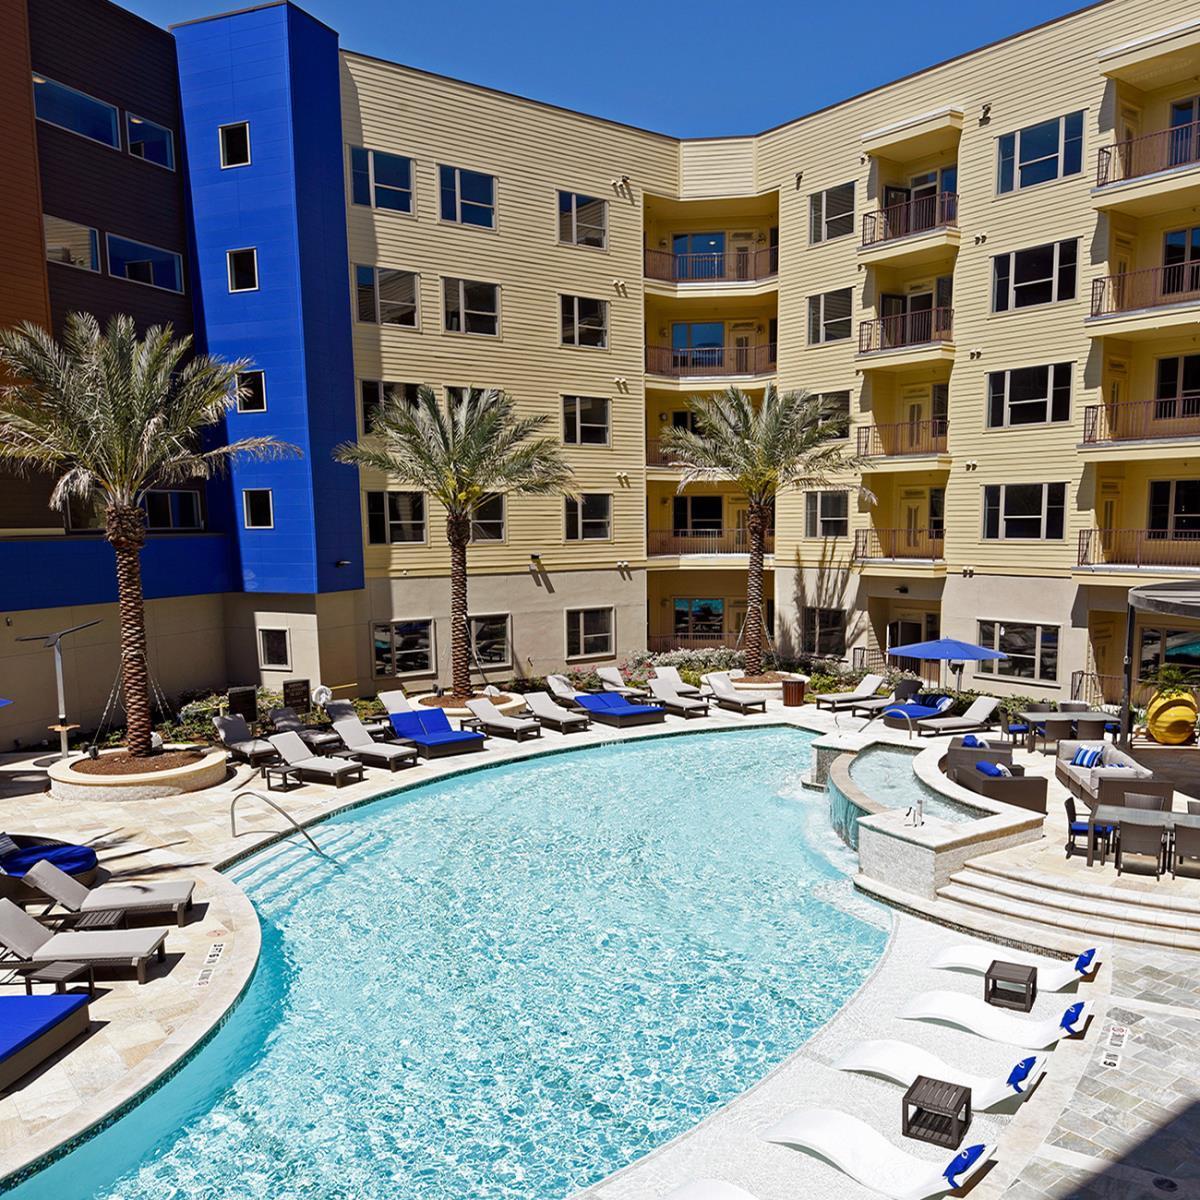 Elan Memorial Park Apartments Houston, TX